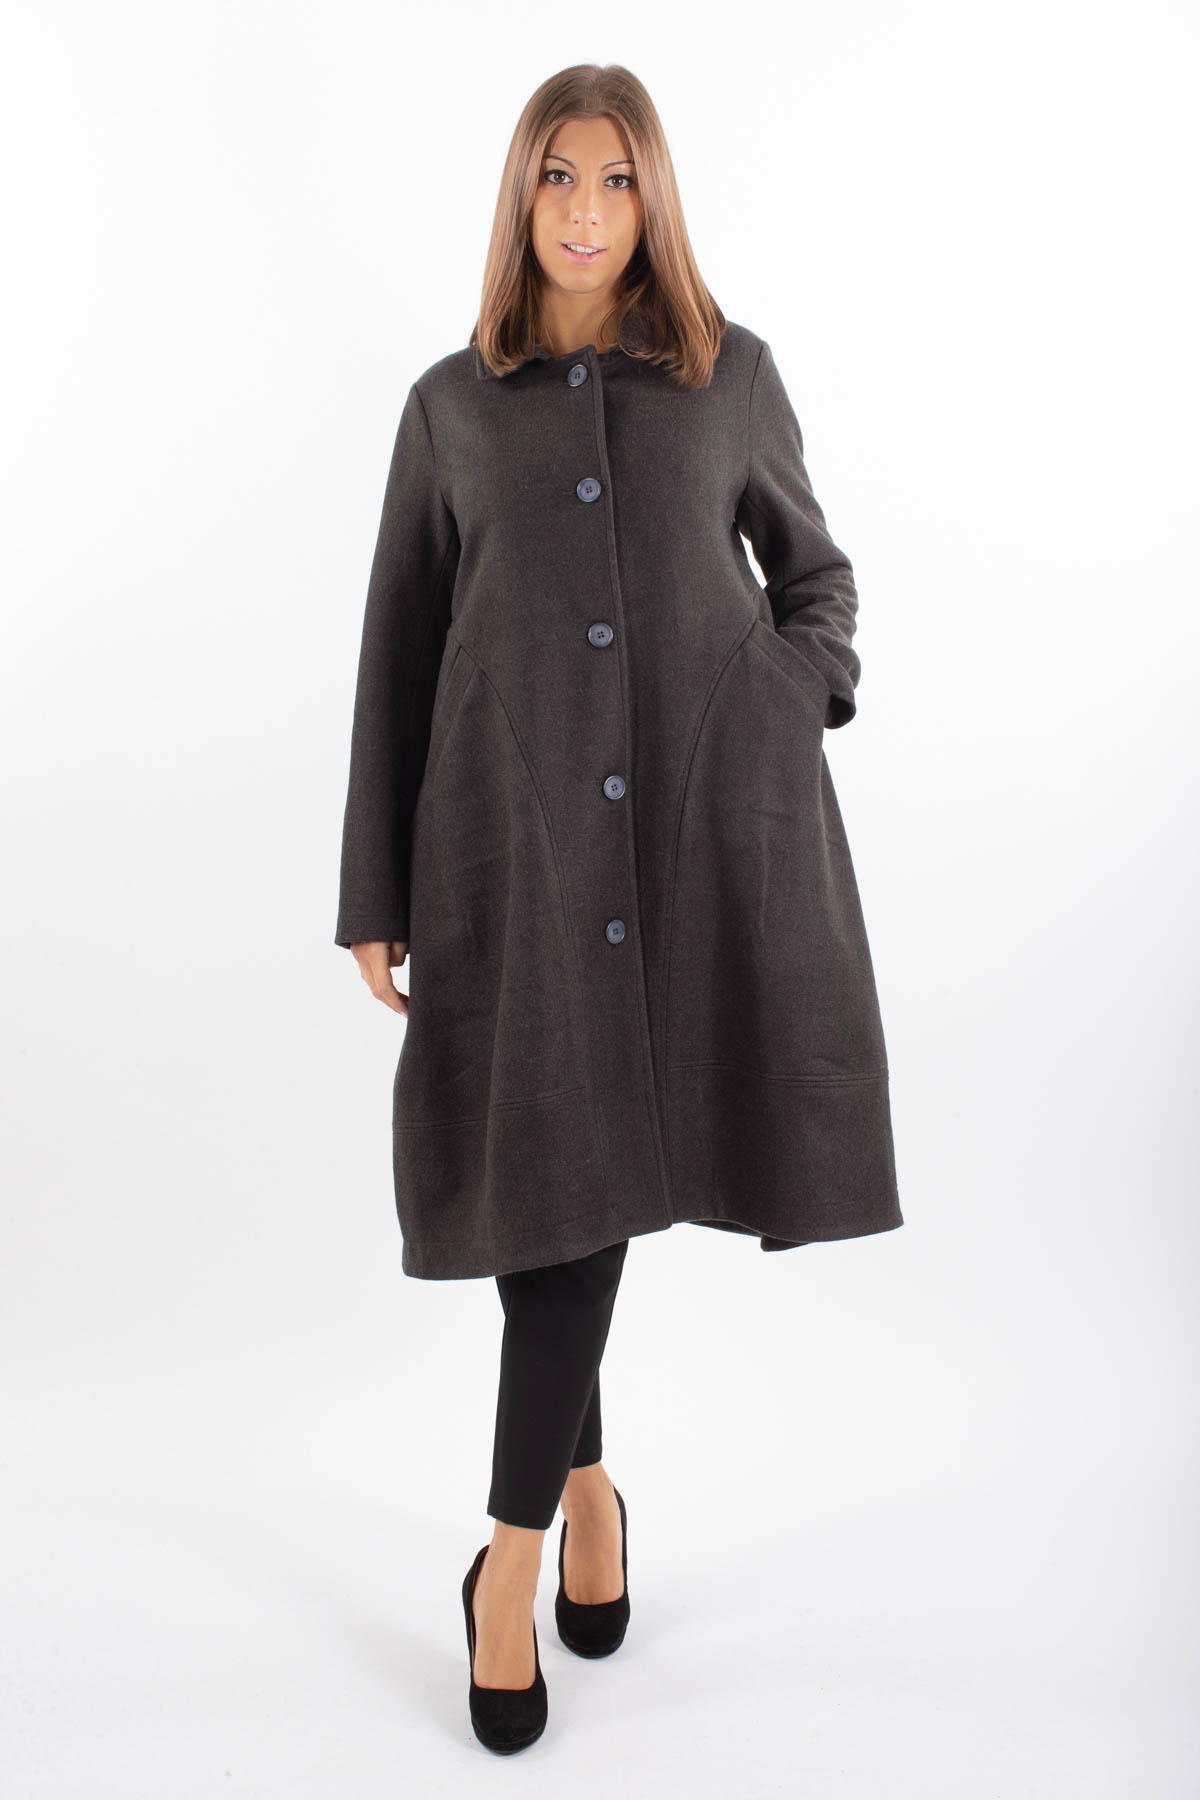 FLARED LONG COAT for women -  - Paquito Pronto Moda Shop Online